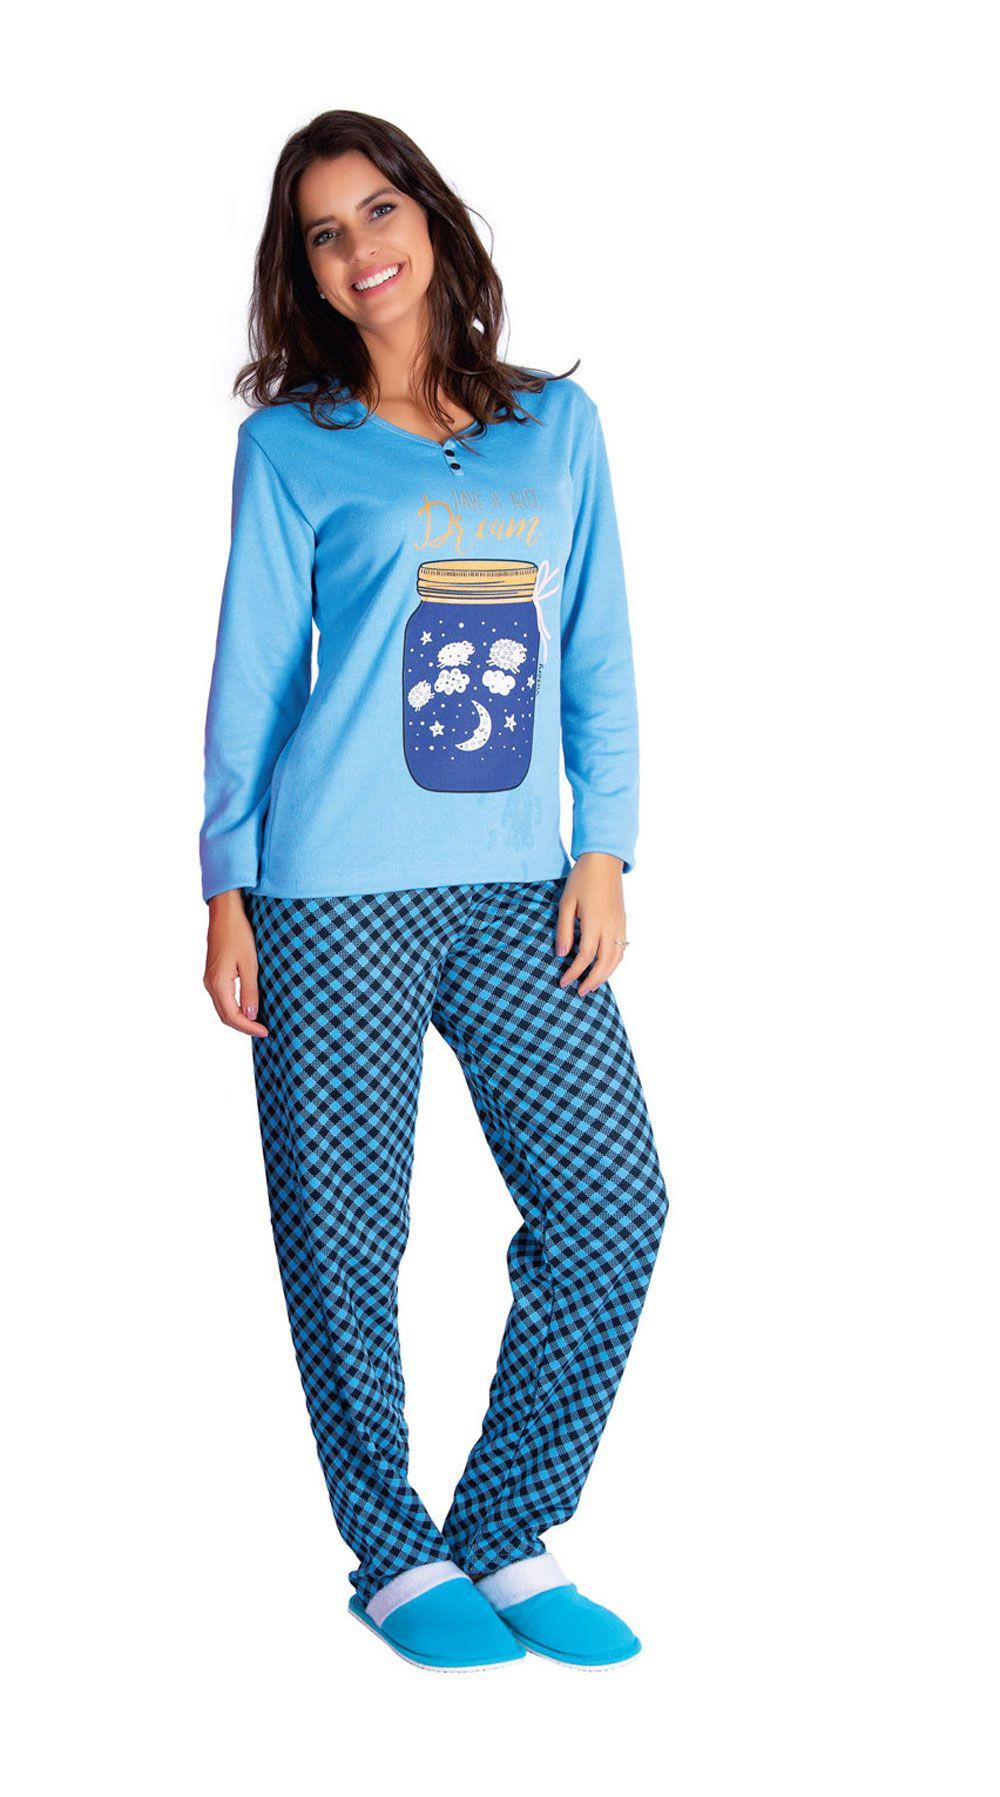 Pijama Feminino de Inverno Canelado Xadrez - Victory 19103